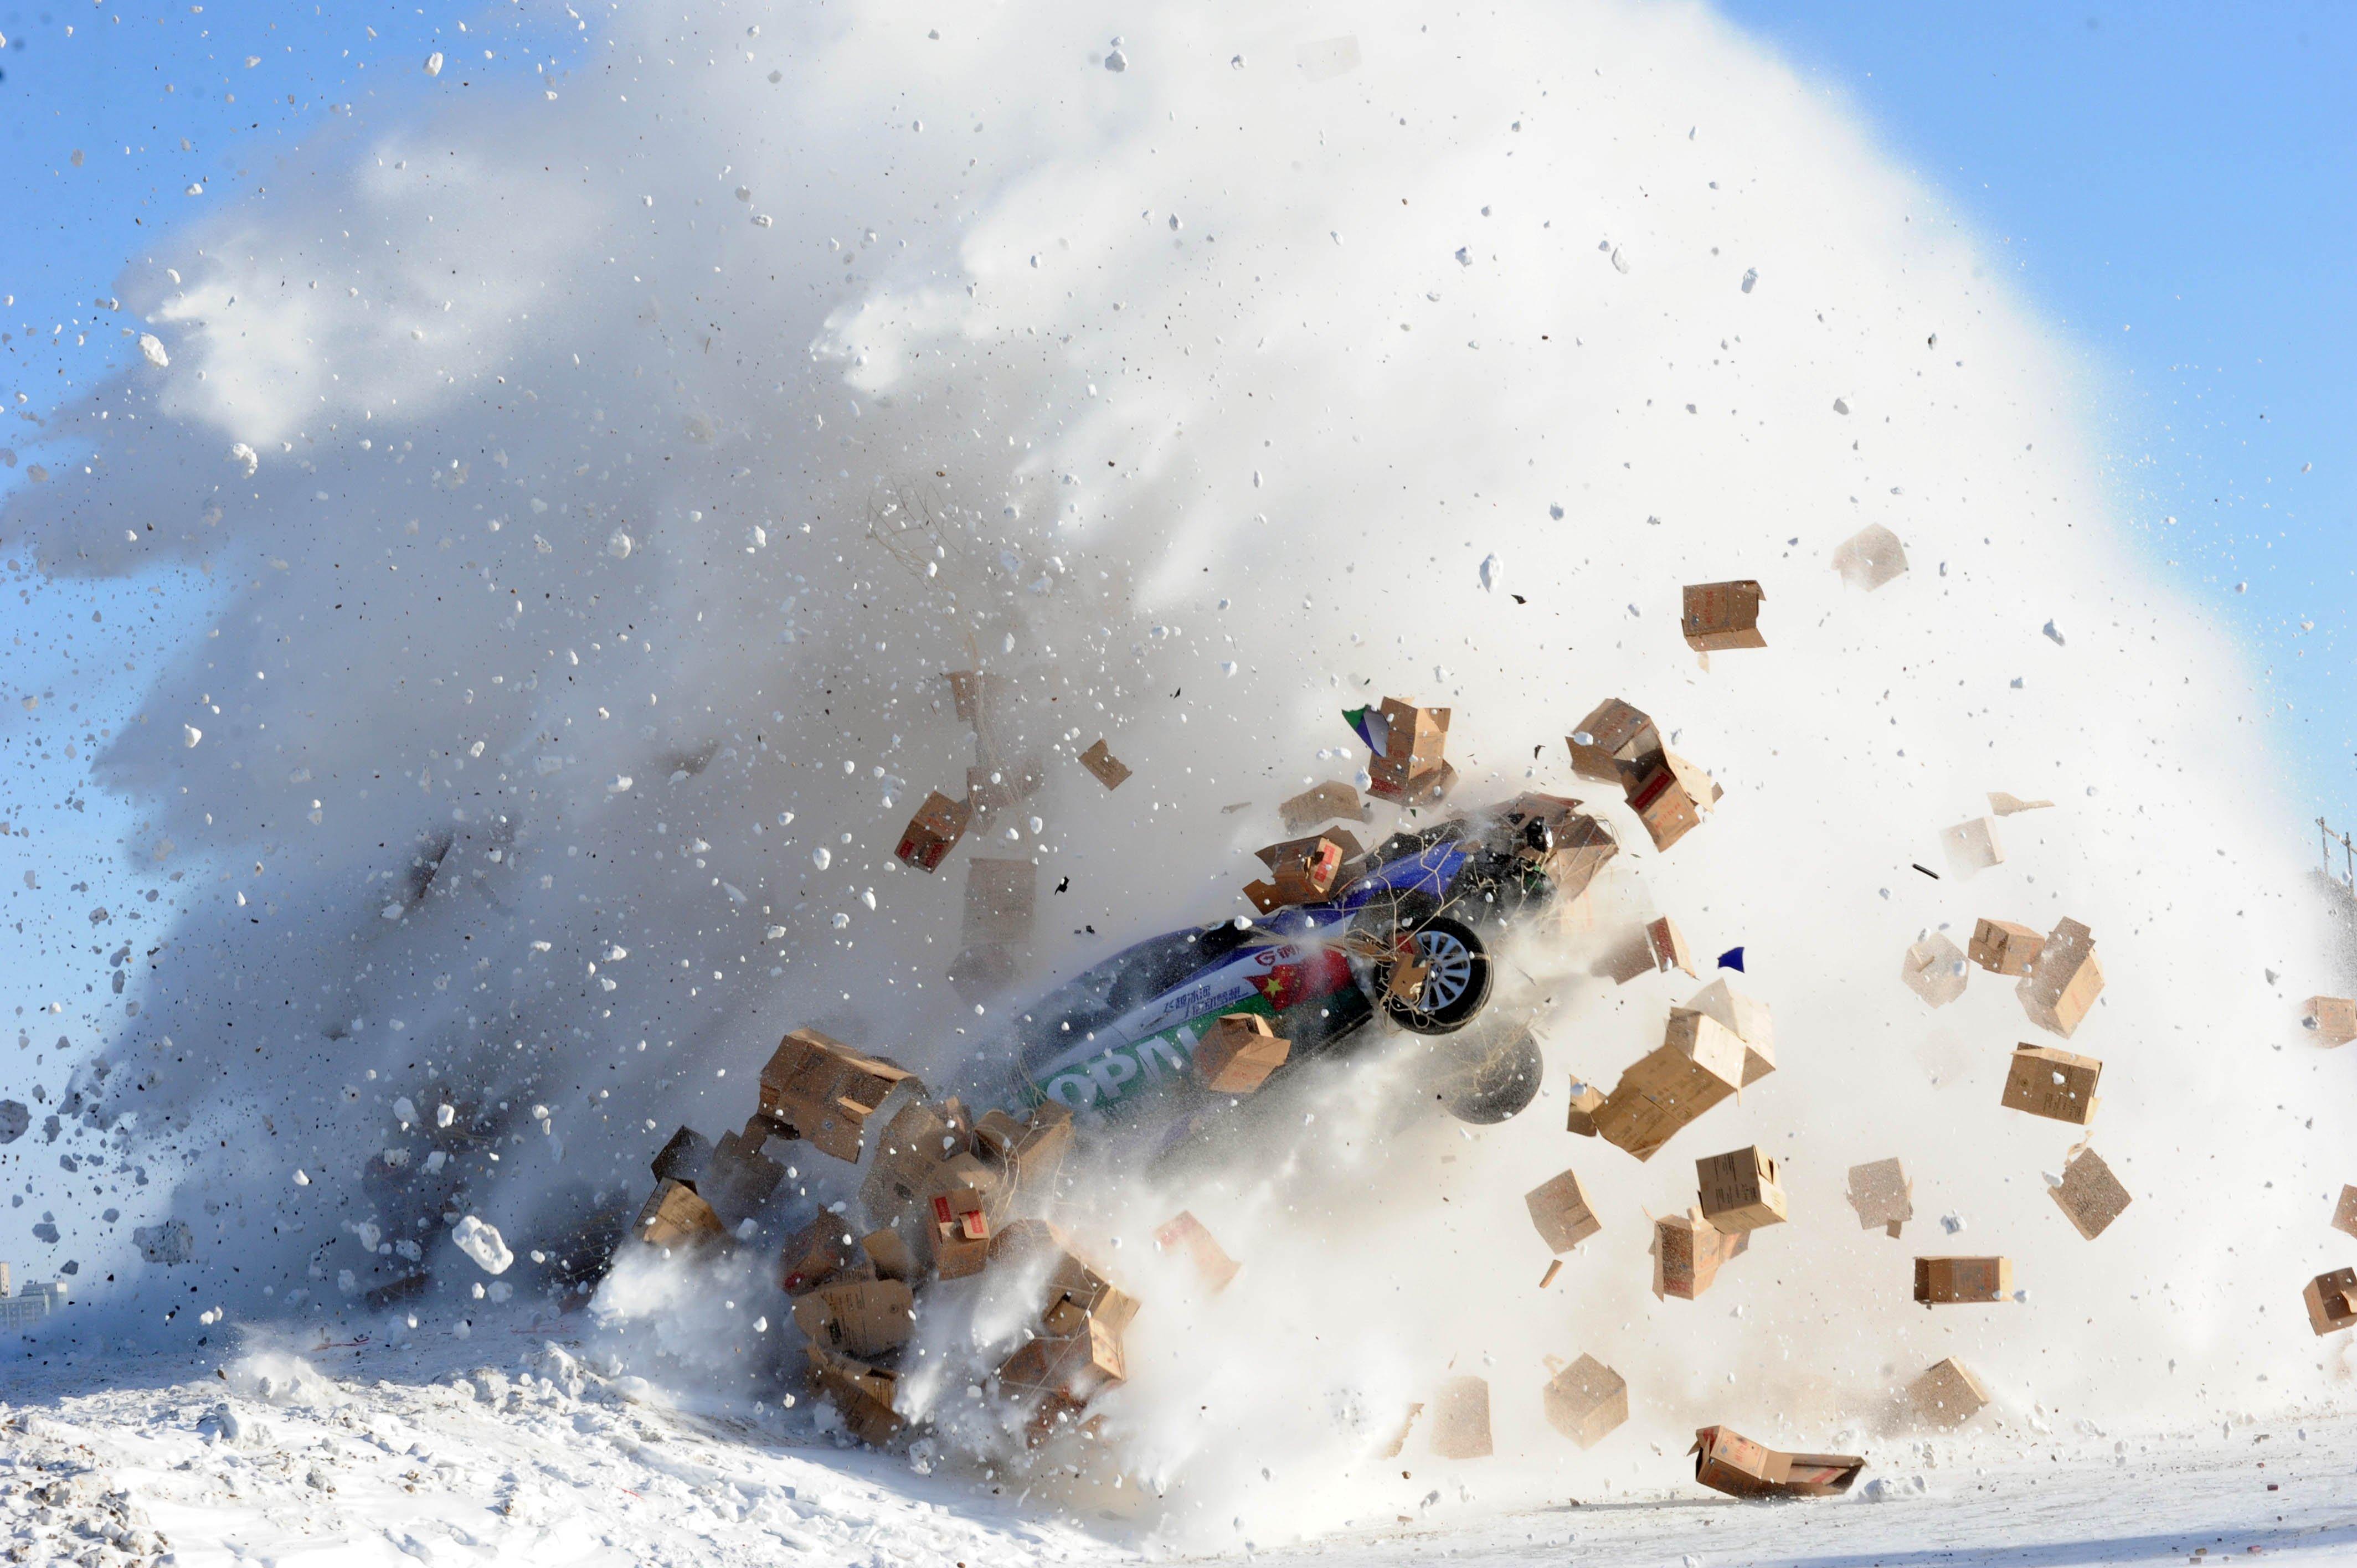 Daredevil Xie Yujun leaps over the frozen Heilongjiang River in a stunt car in Heihe, north China's Heilongjiang province, Jan. 12, 2014.